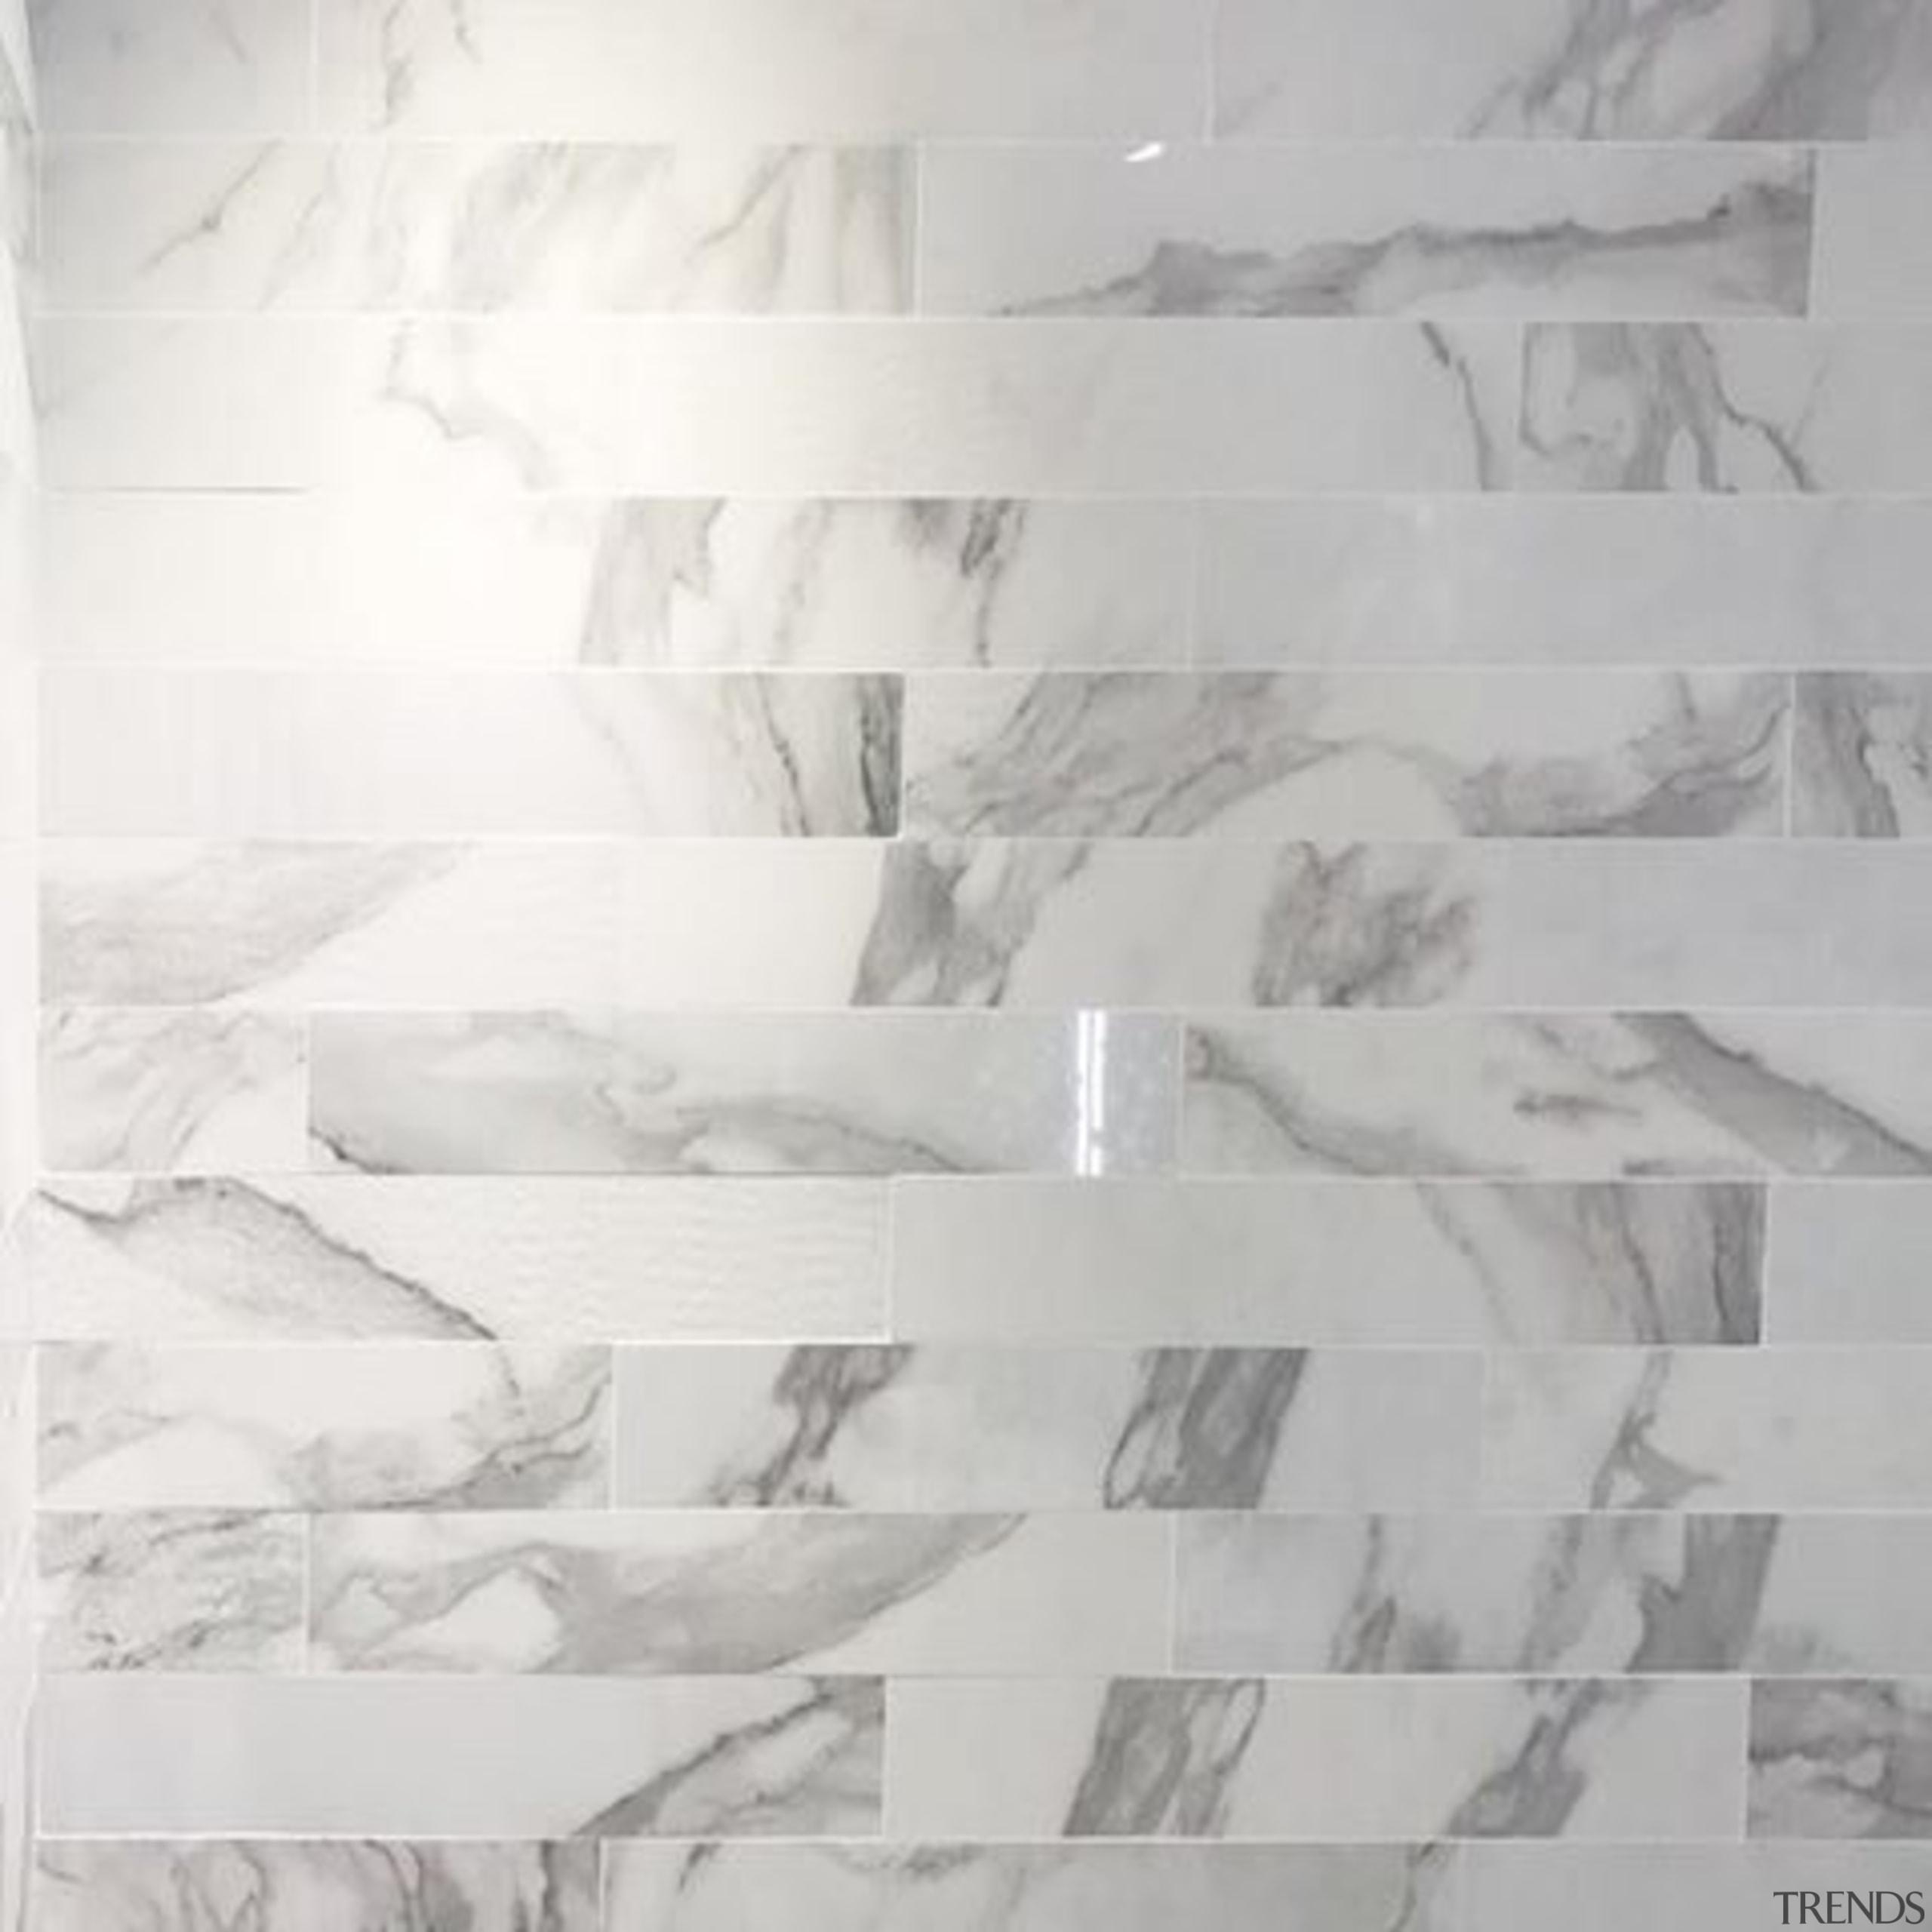 Marstood Mix 100x600 - Marstood Mix 100x600 - black and white, drawing, floor, monochrome, monochrome photography, wall, white, gray